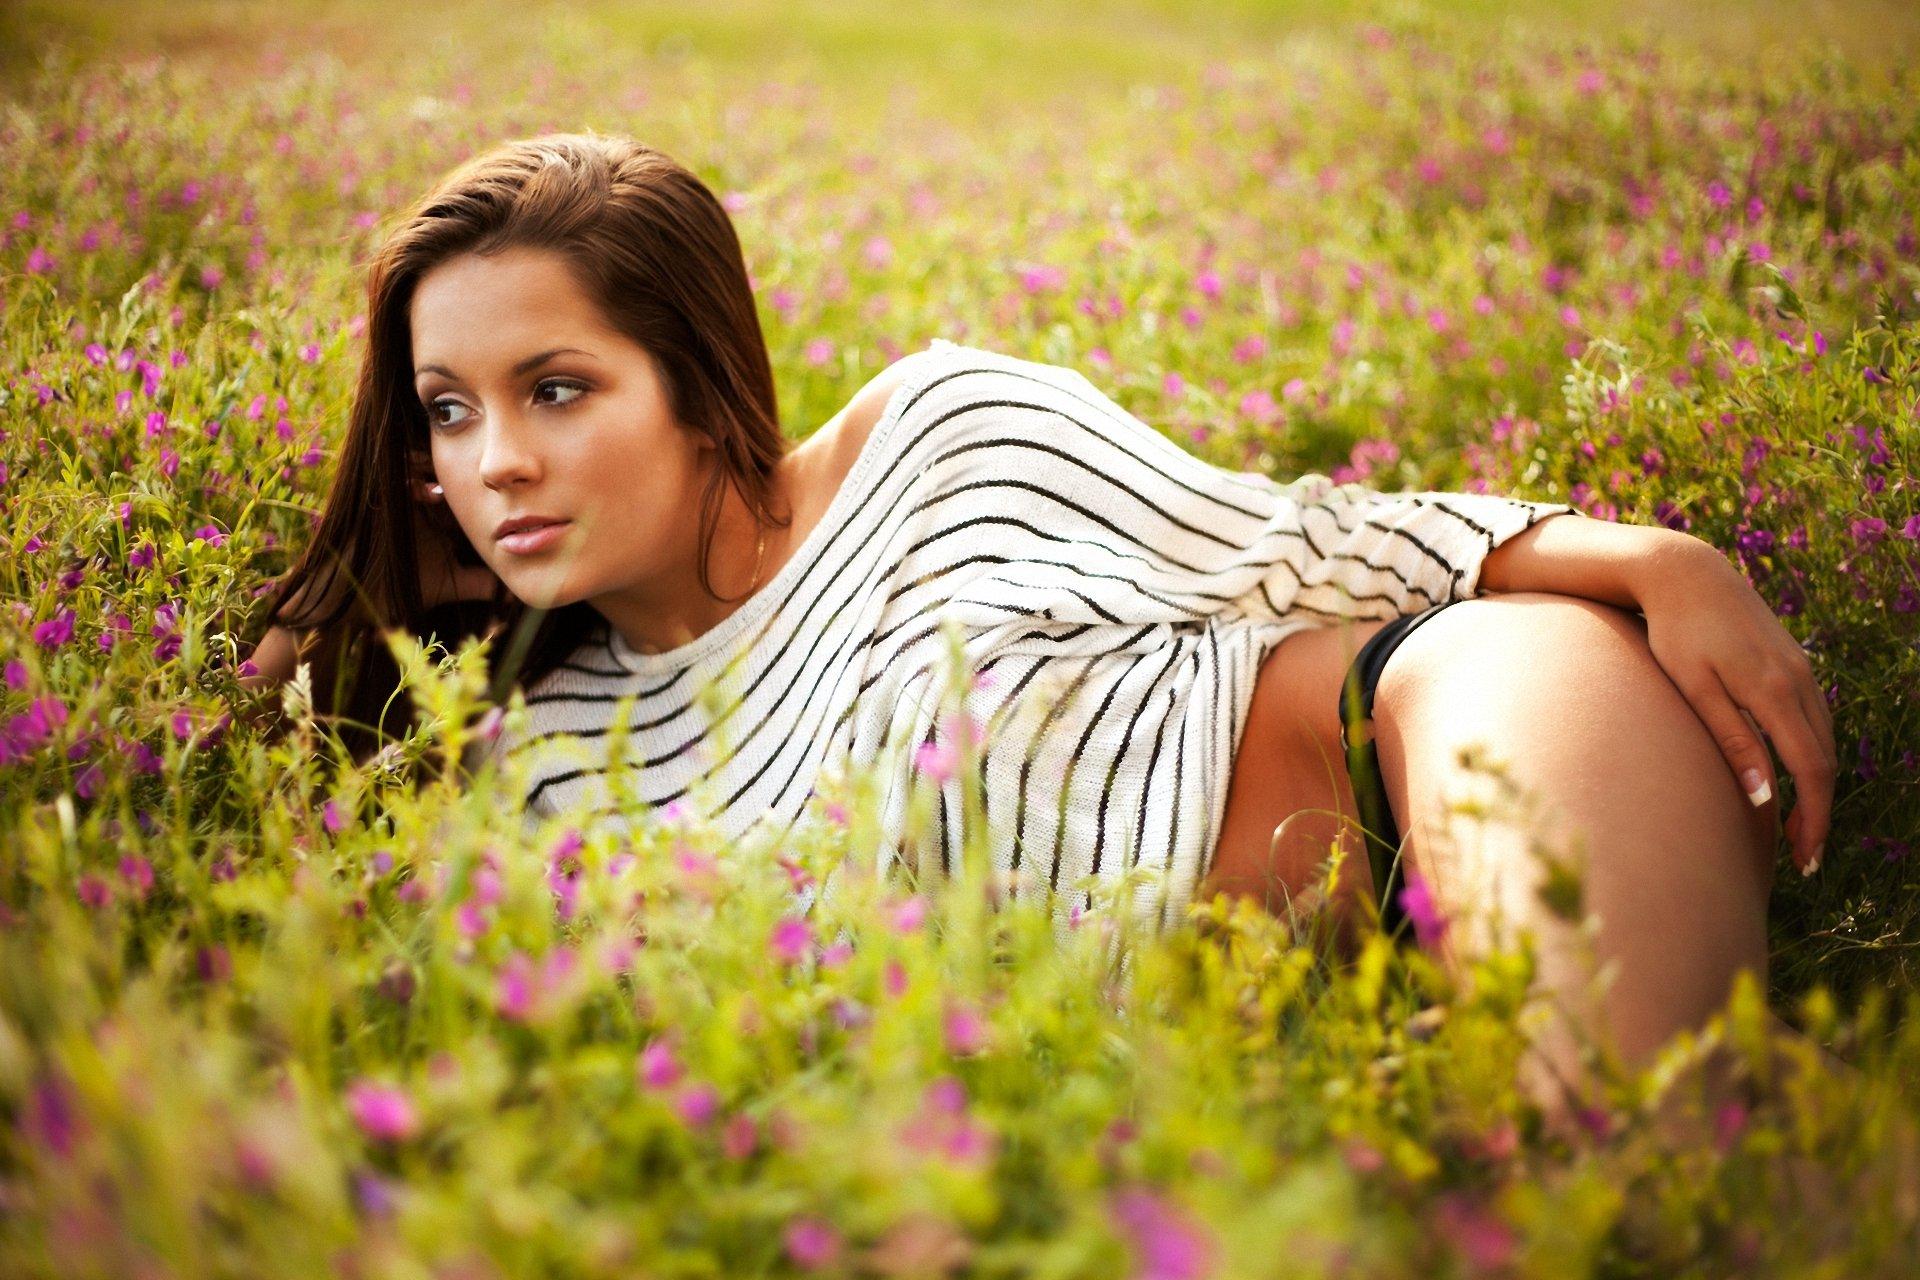 Горячие девушки на природе фото — img 13